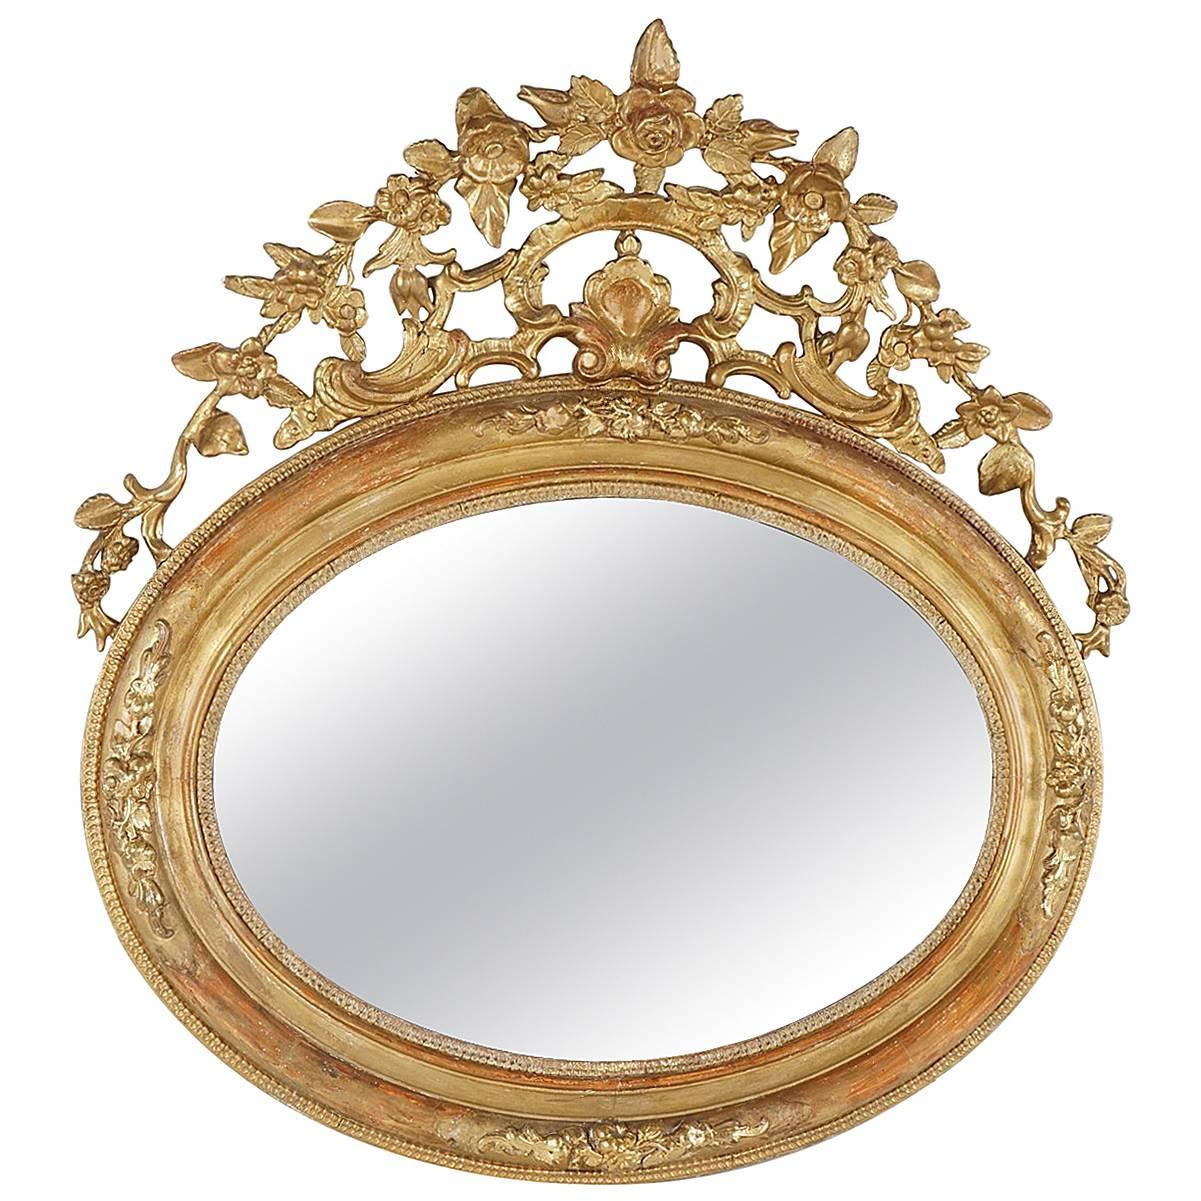 Victorian Oval Gilded Rococo Revival Mirror